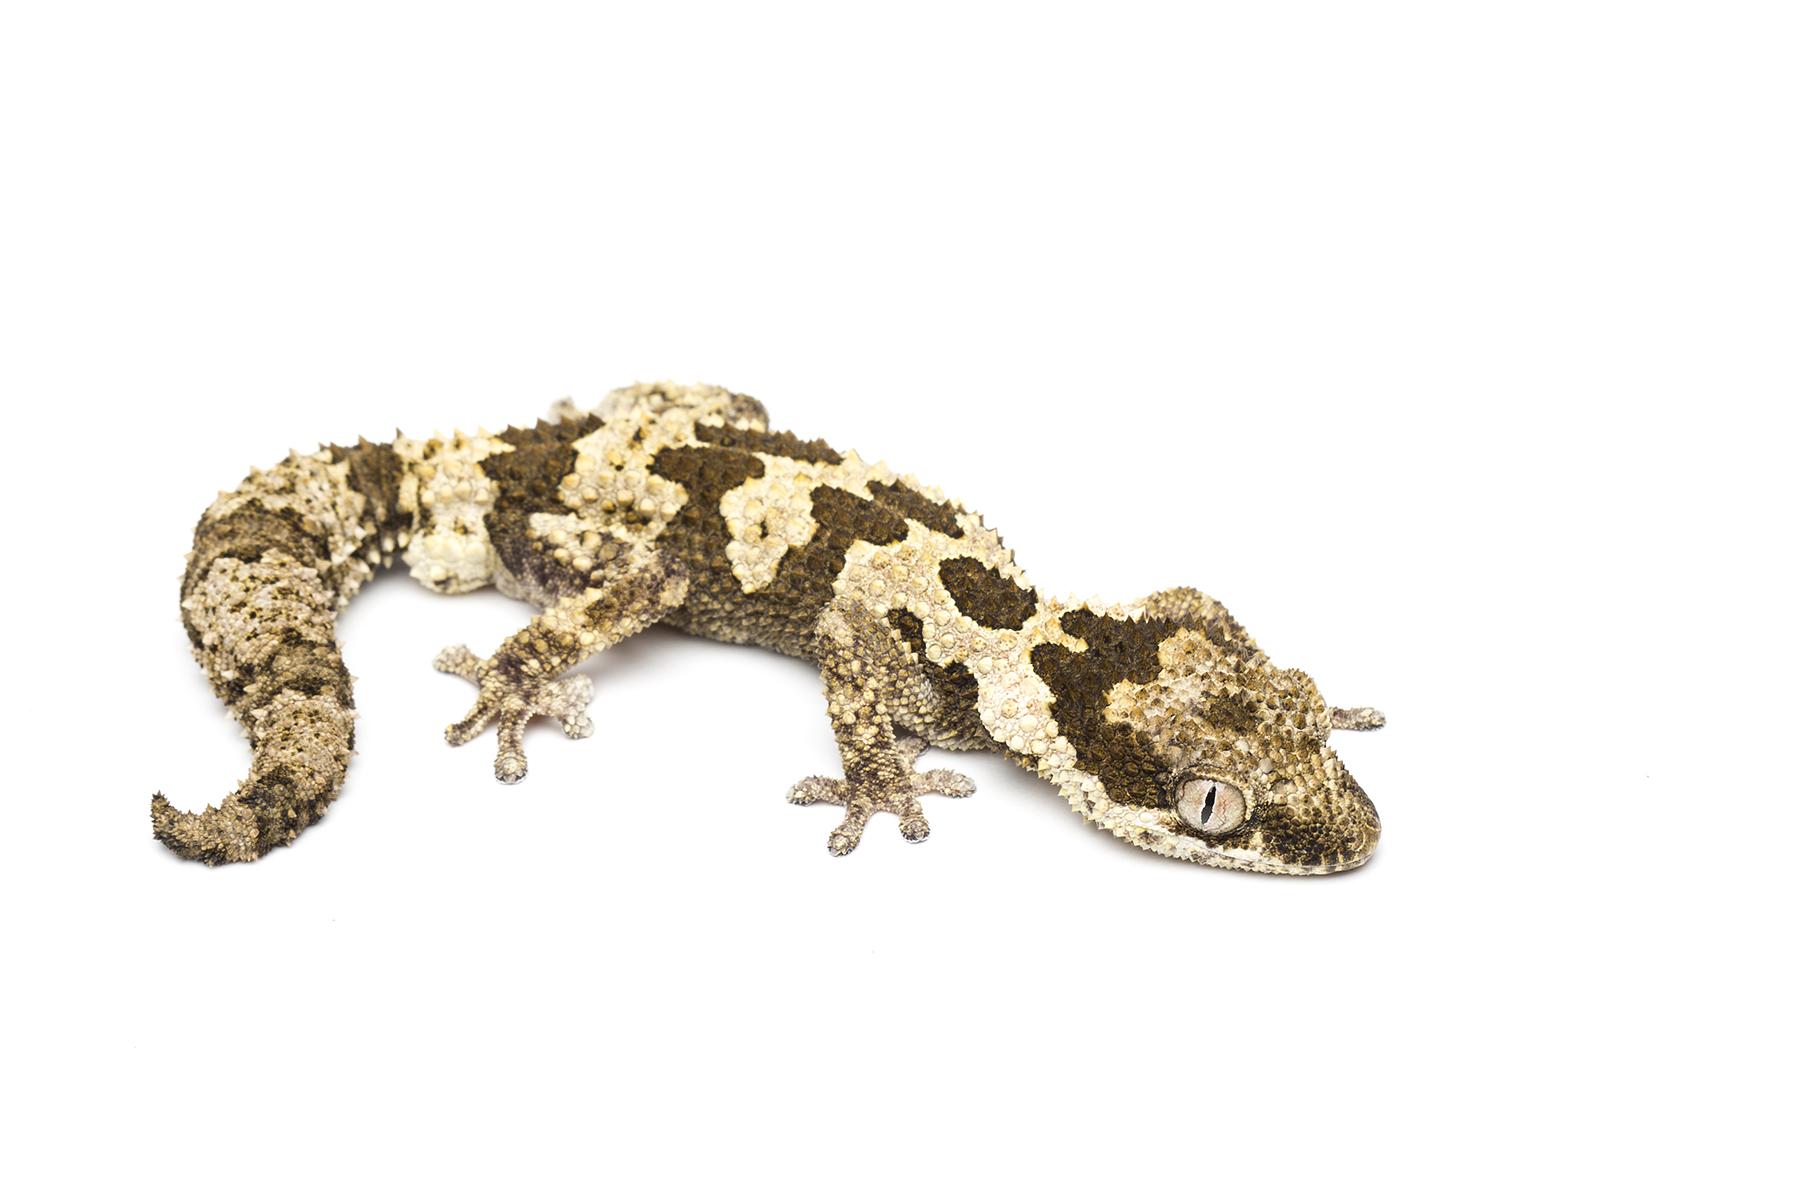 Adult male Pachydactylus rugosus